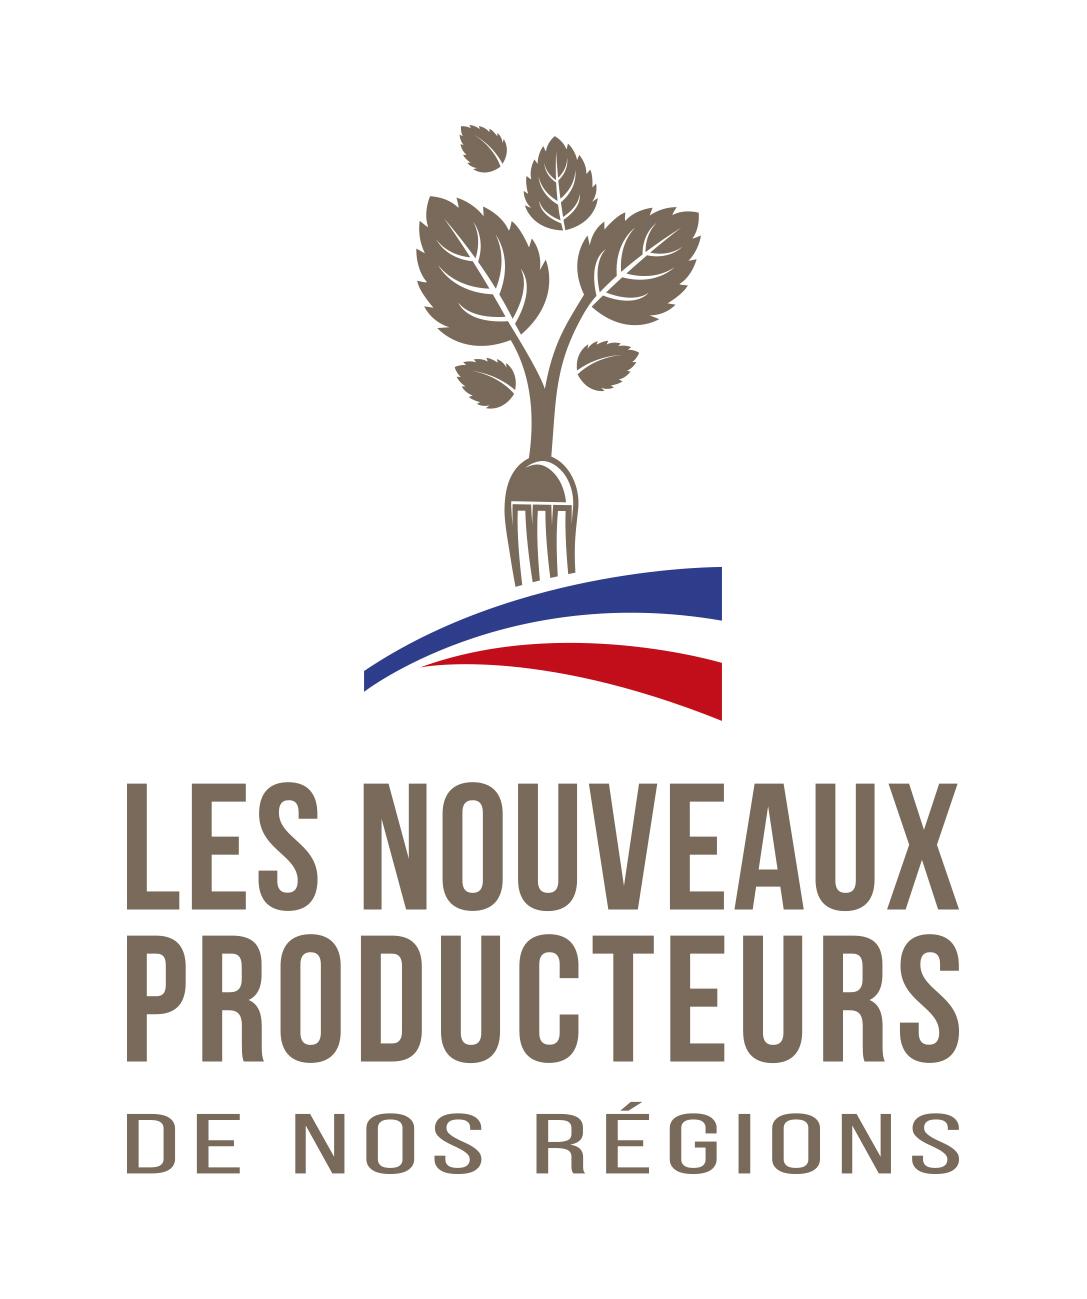 LNP de nos regions 2020 - CMJN